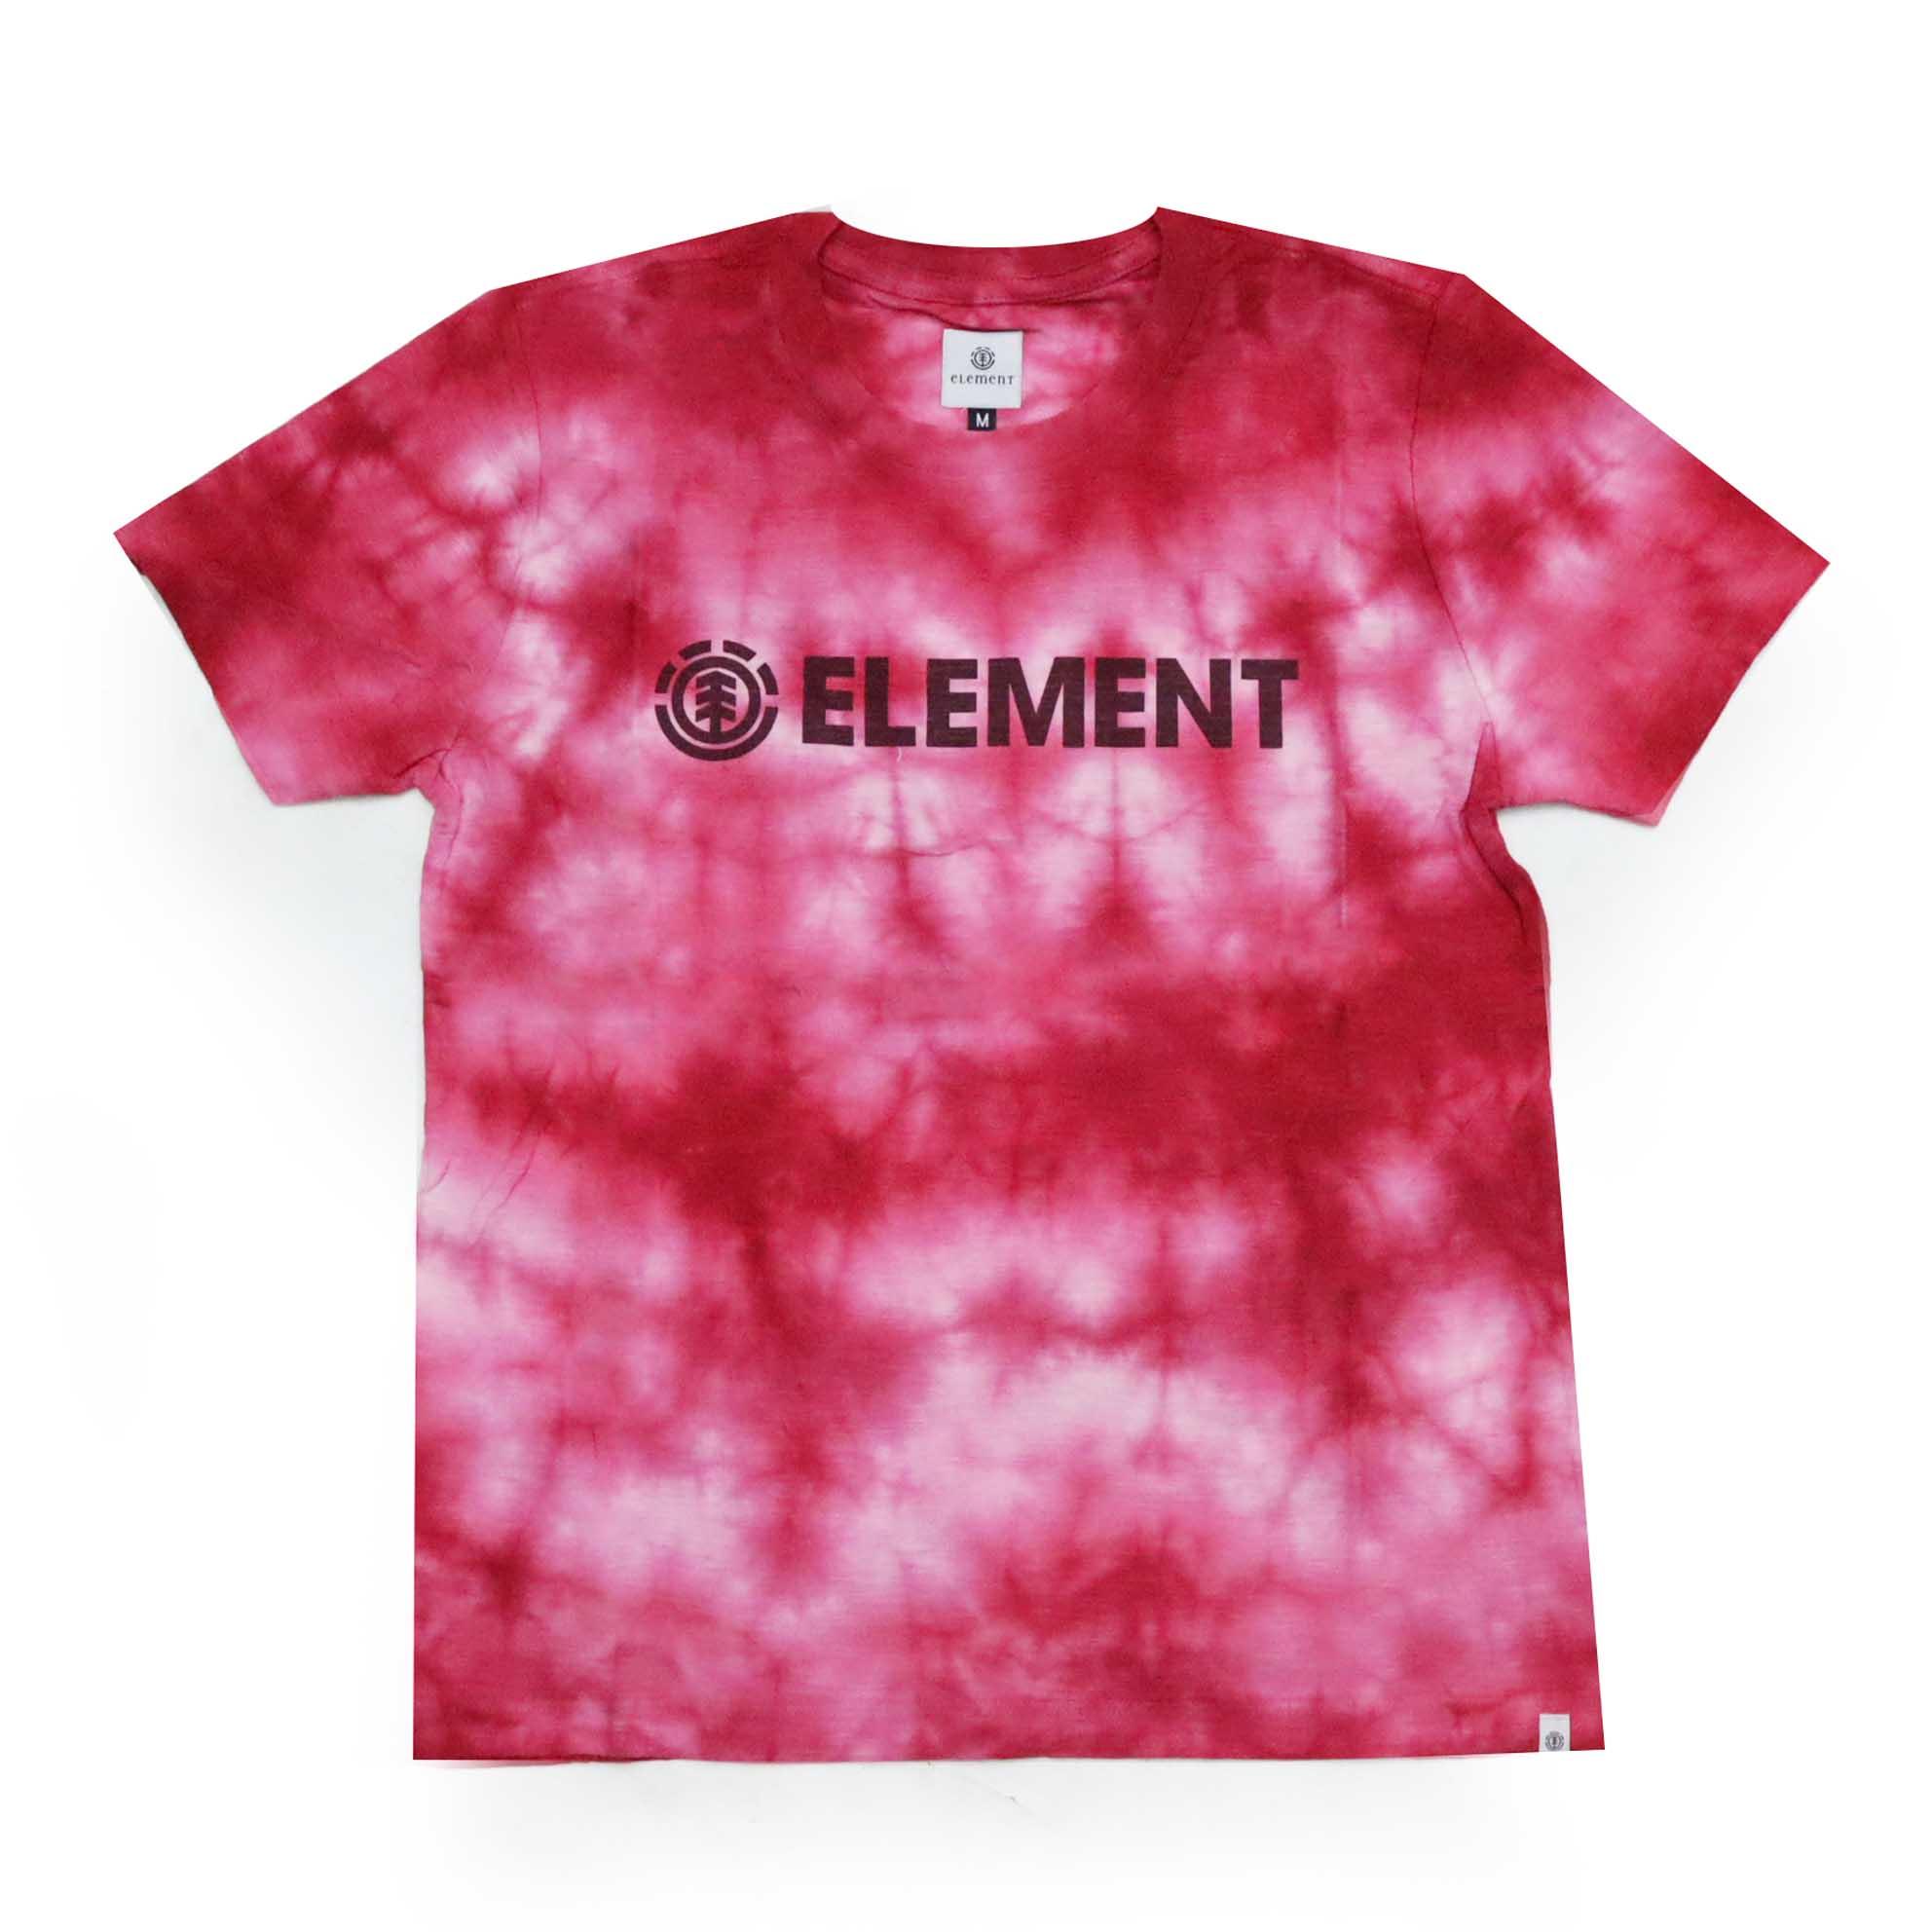 Camiseta Feminina Element Pink Dye - Tie Dye Rosa